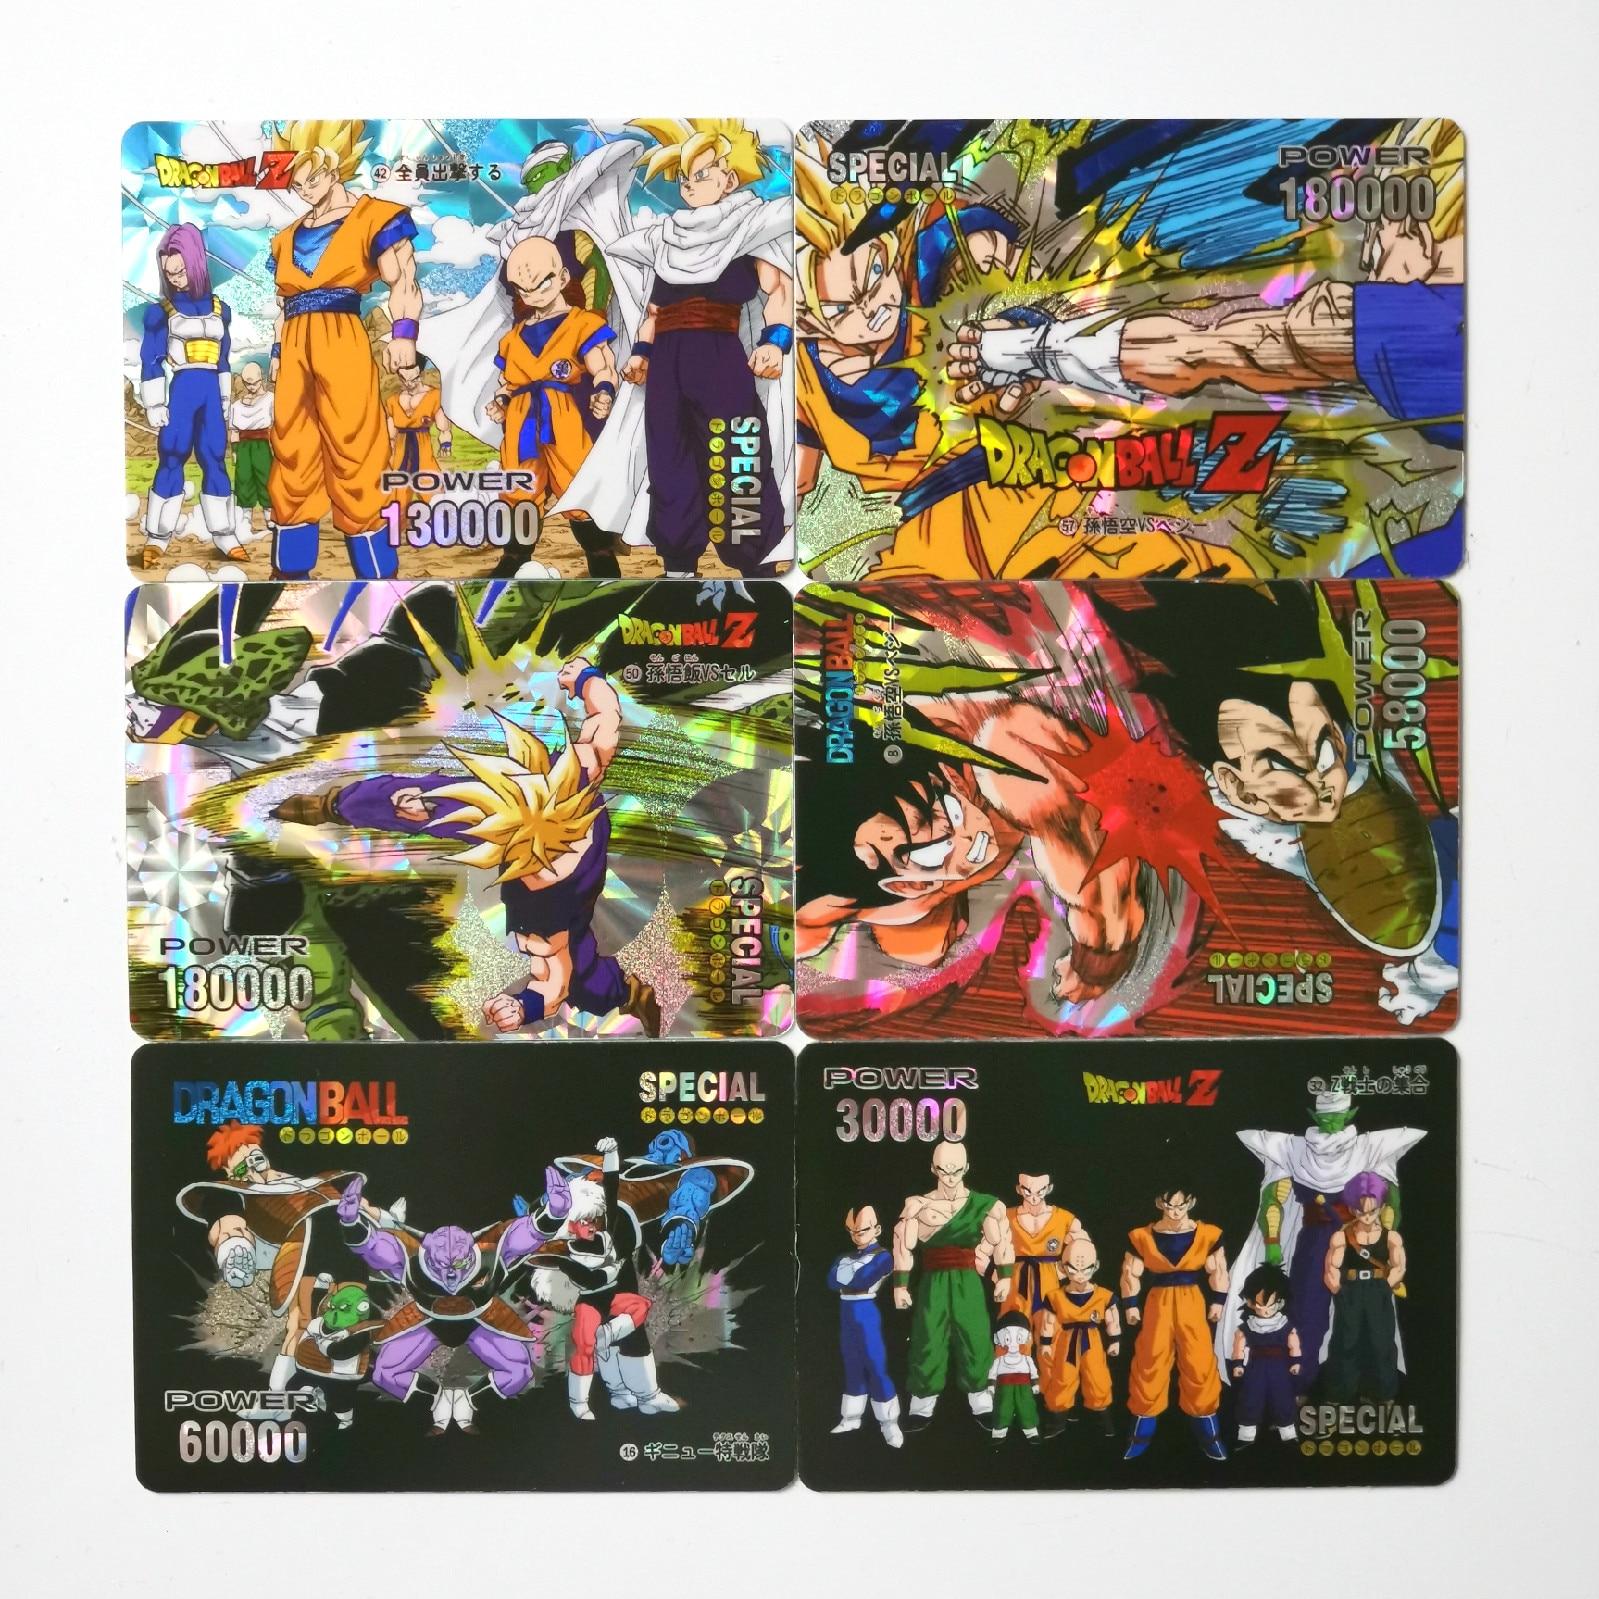 63pcs/set Super Dragon Ball Z Heroes Pasteable Battle Card Ultra Instinct Goku Vegeta Game Collection Cards